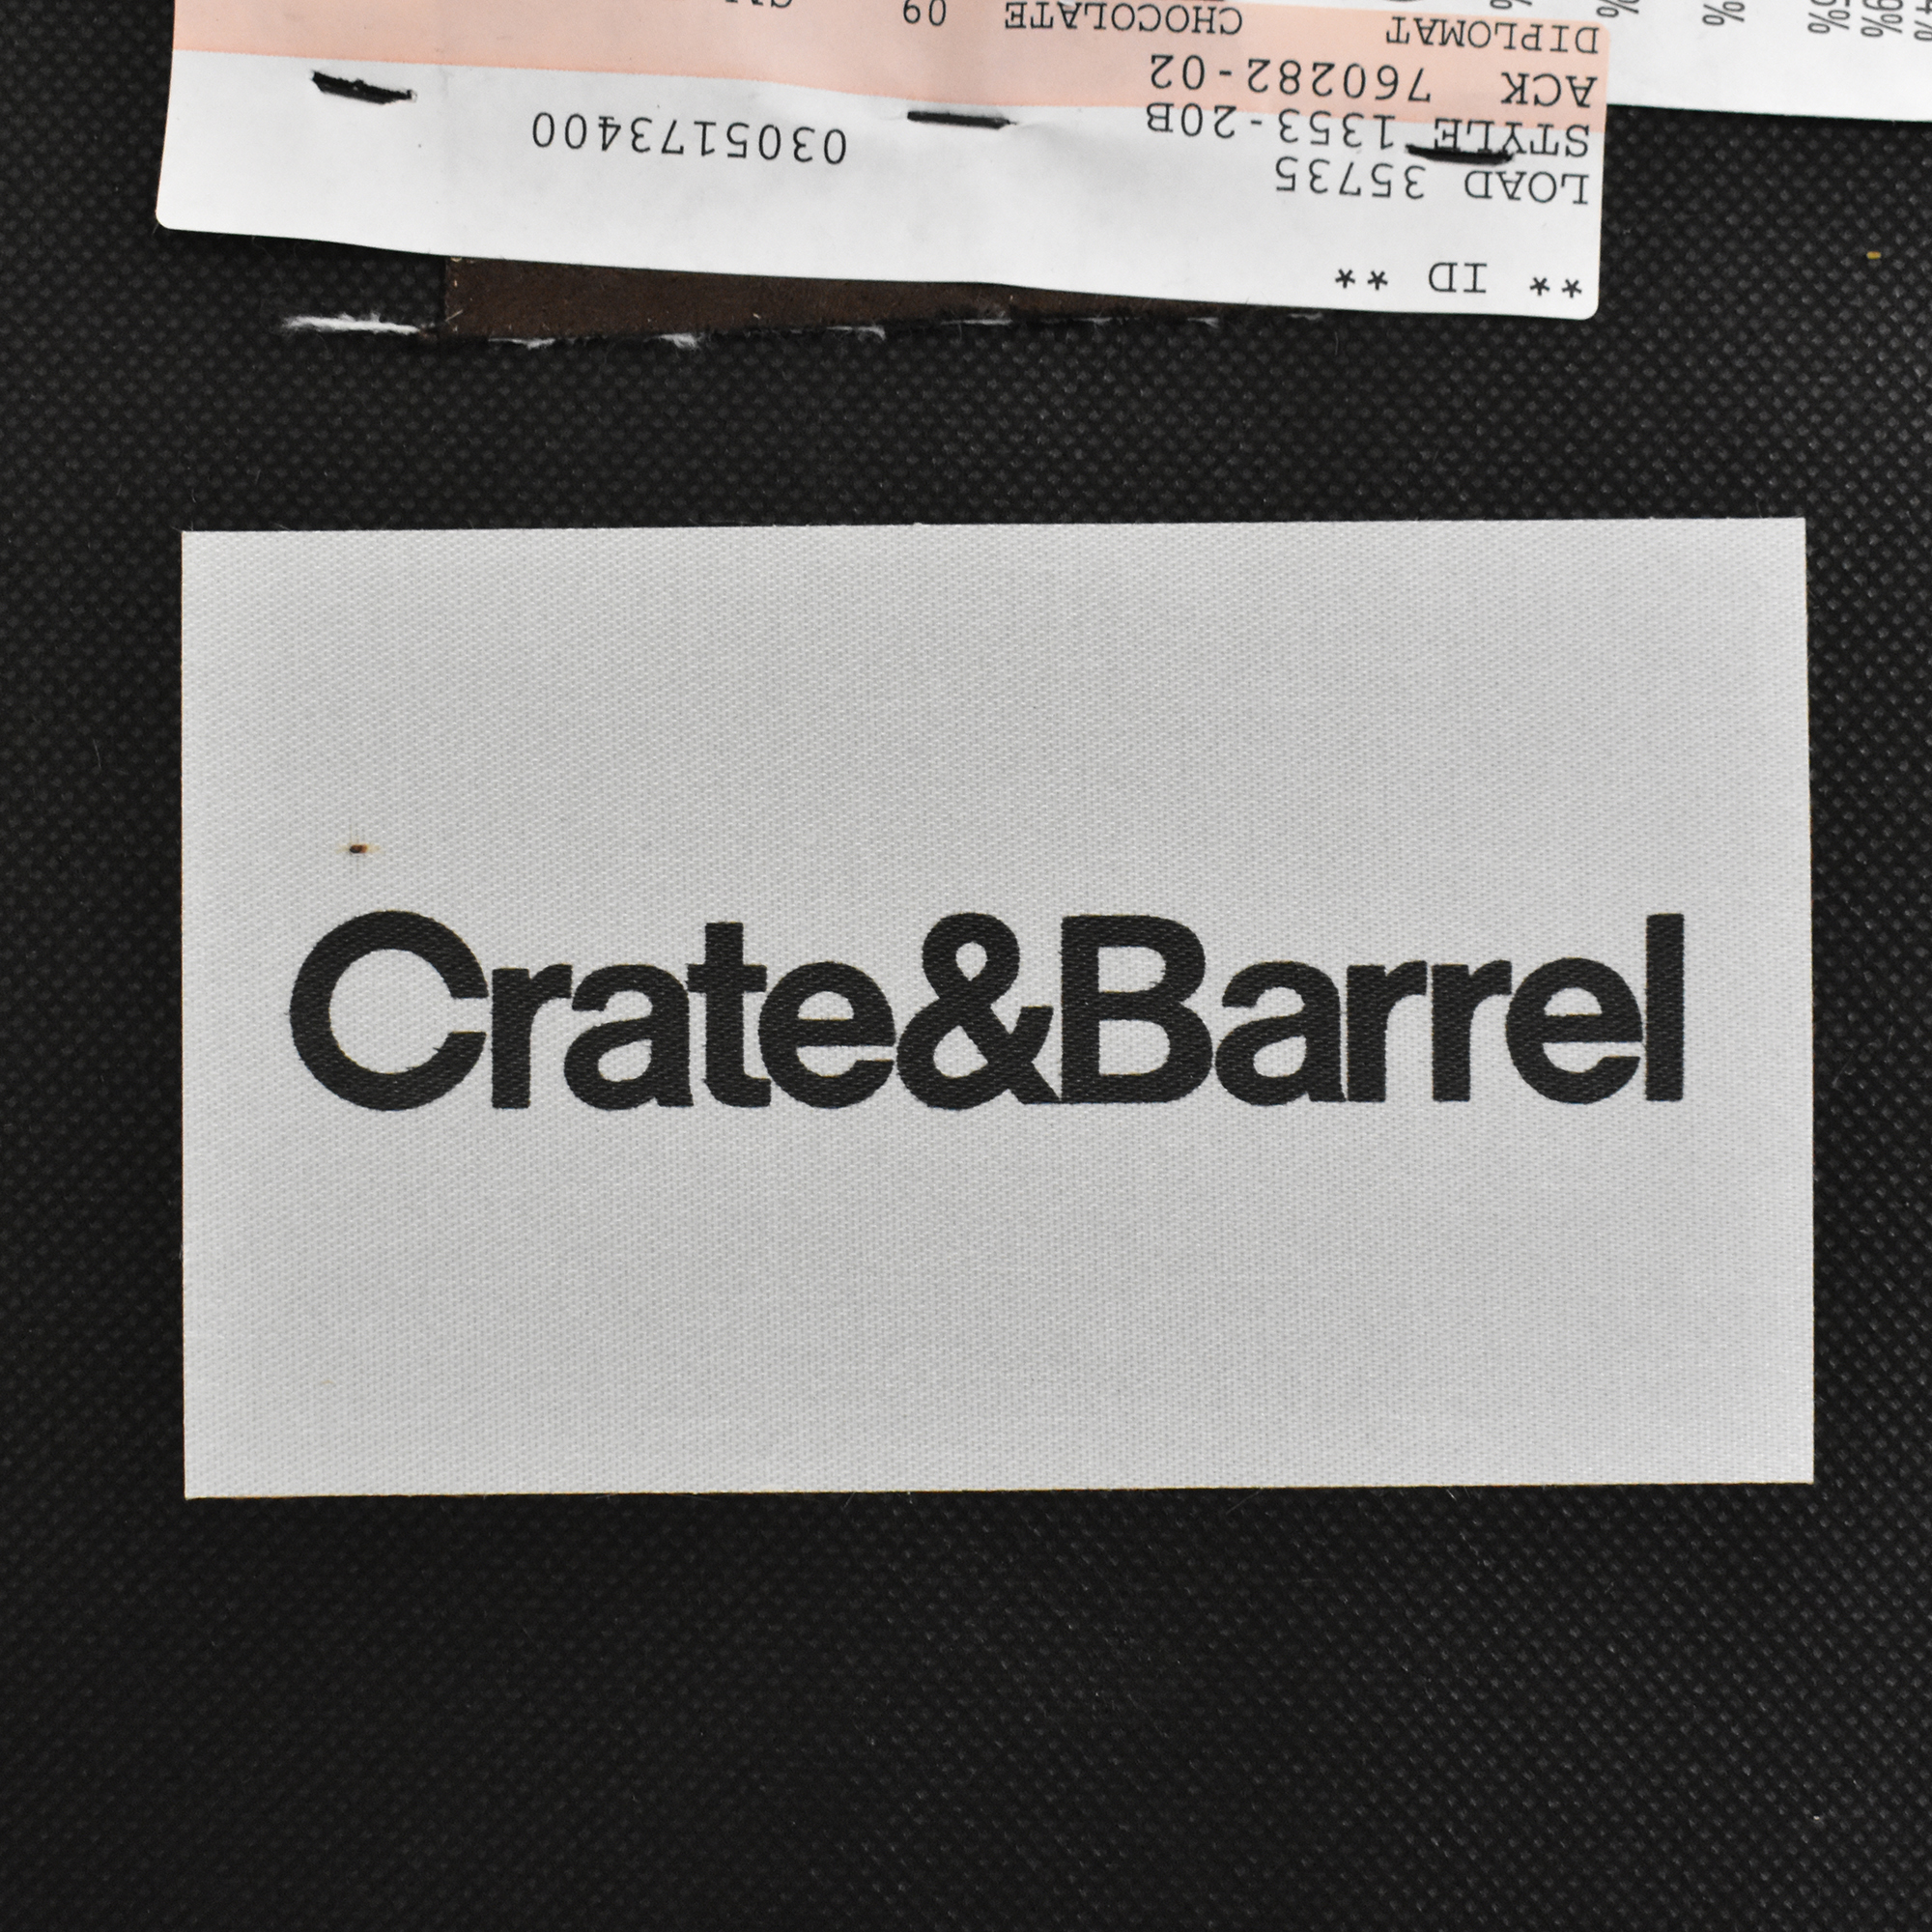 Crate & Barrel Crate & Barrel Axis II Ottoman and a Half Storage